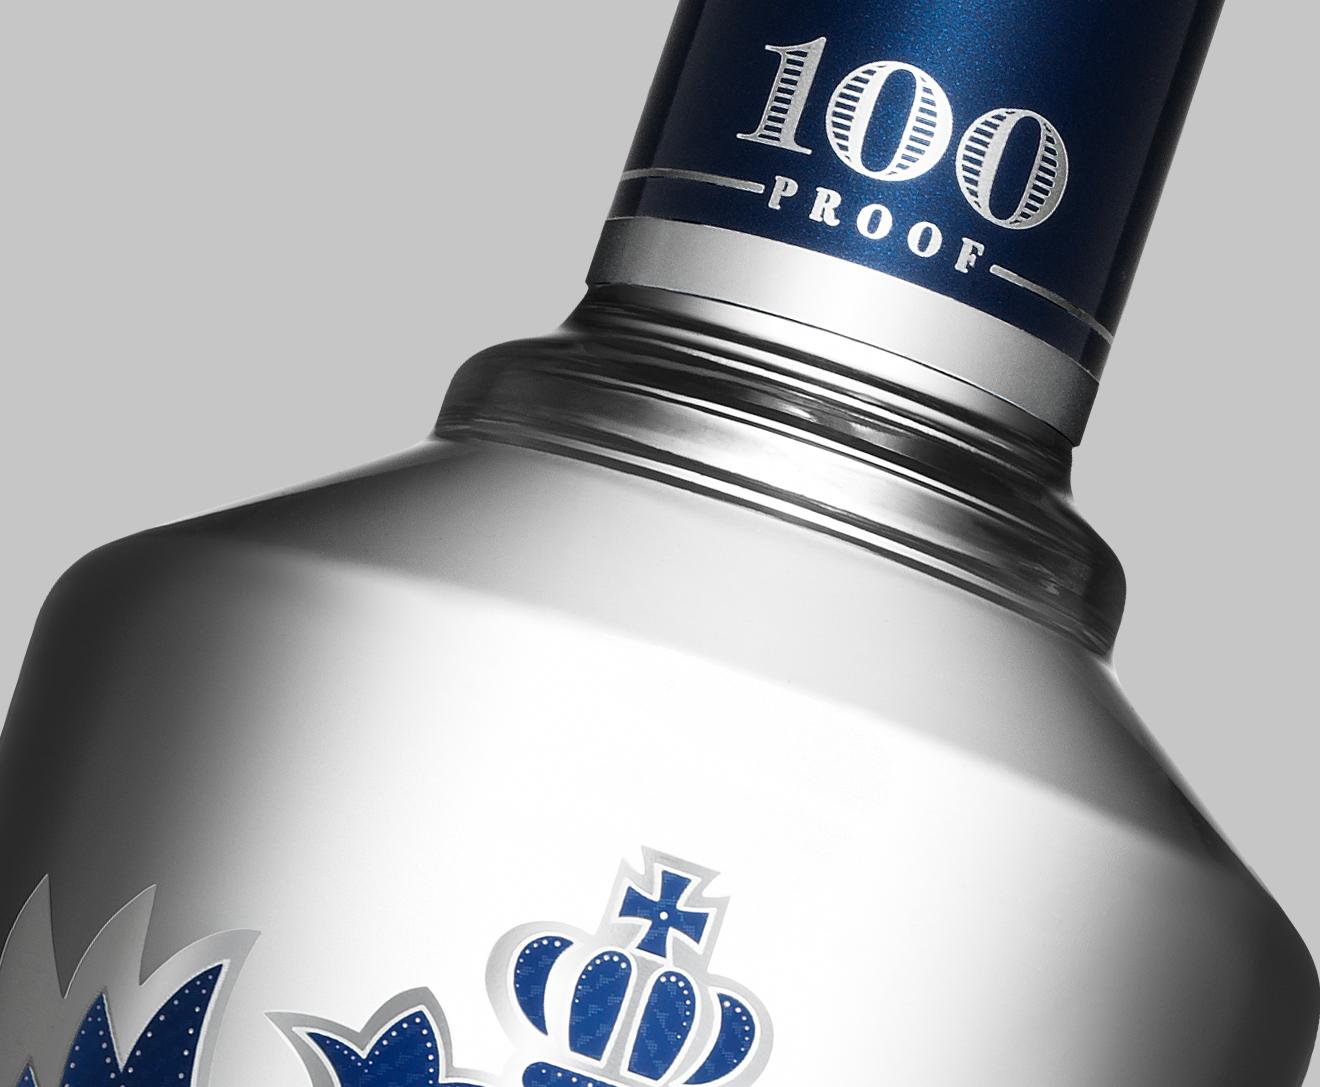 Smirnoff 100 Proof bottle design detail